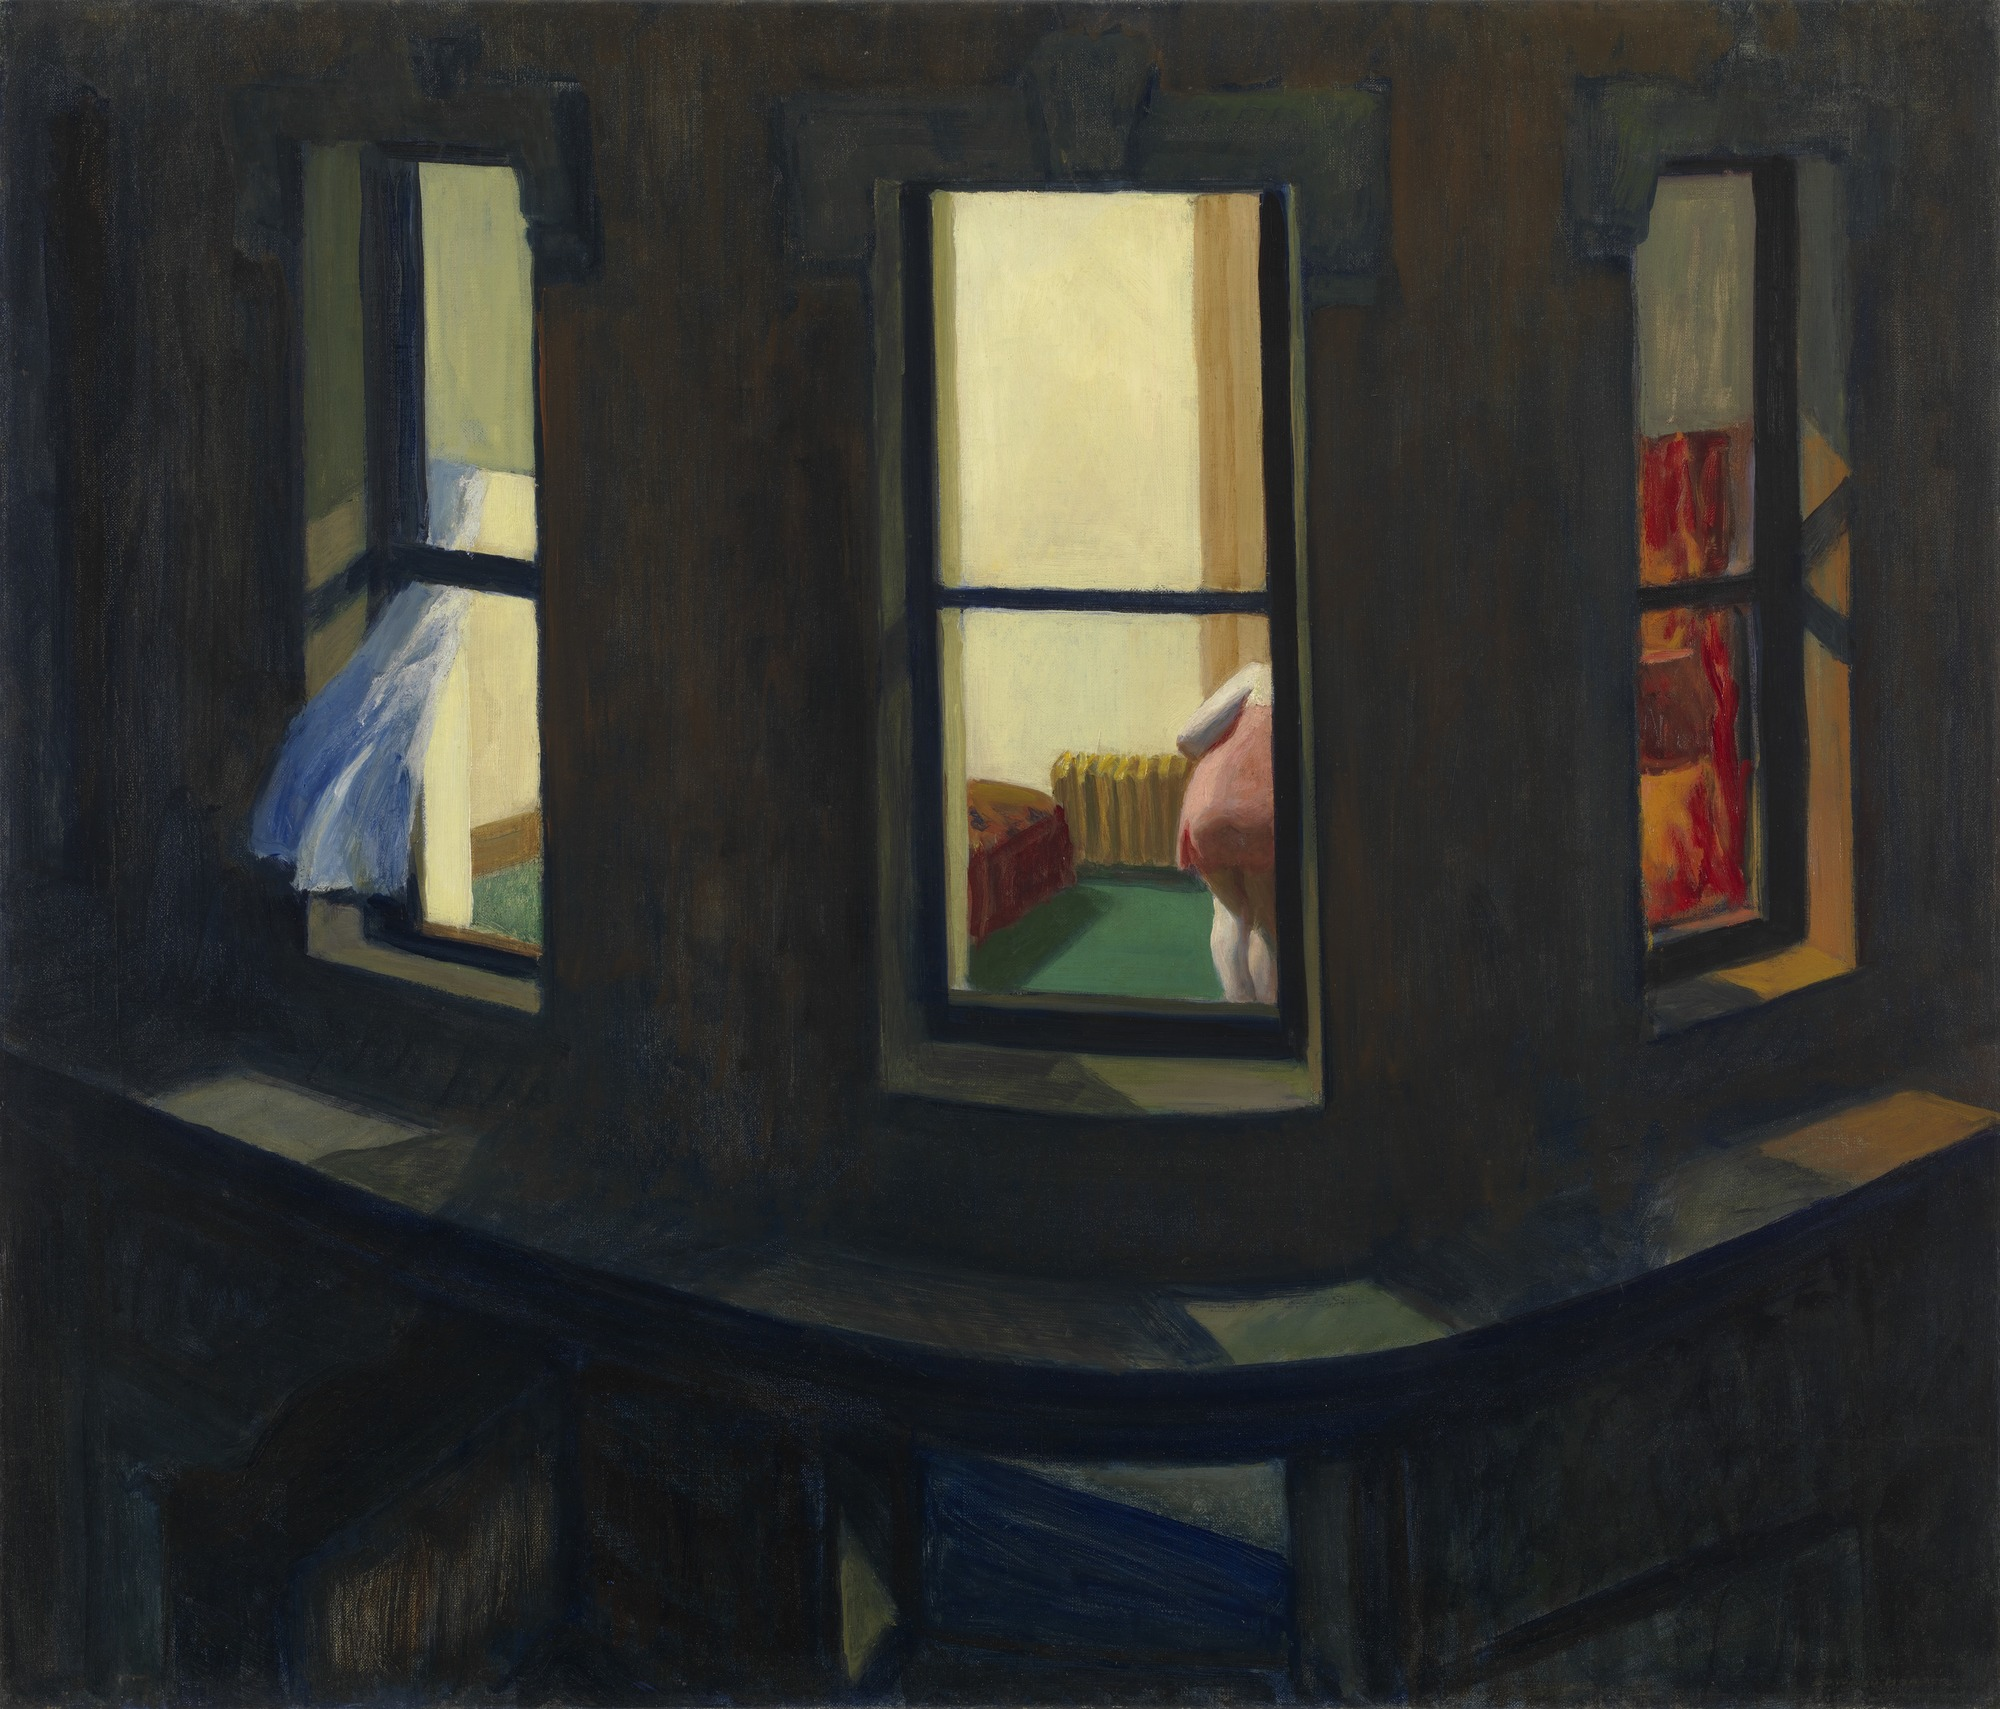 Edward Hopper, Night Windows (1928)